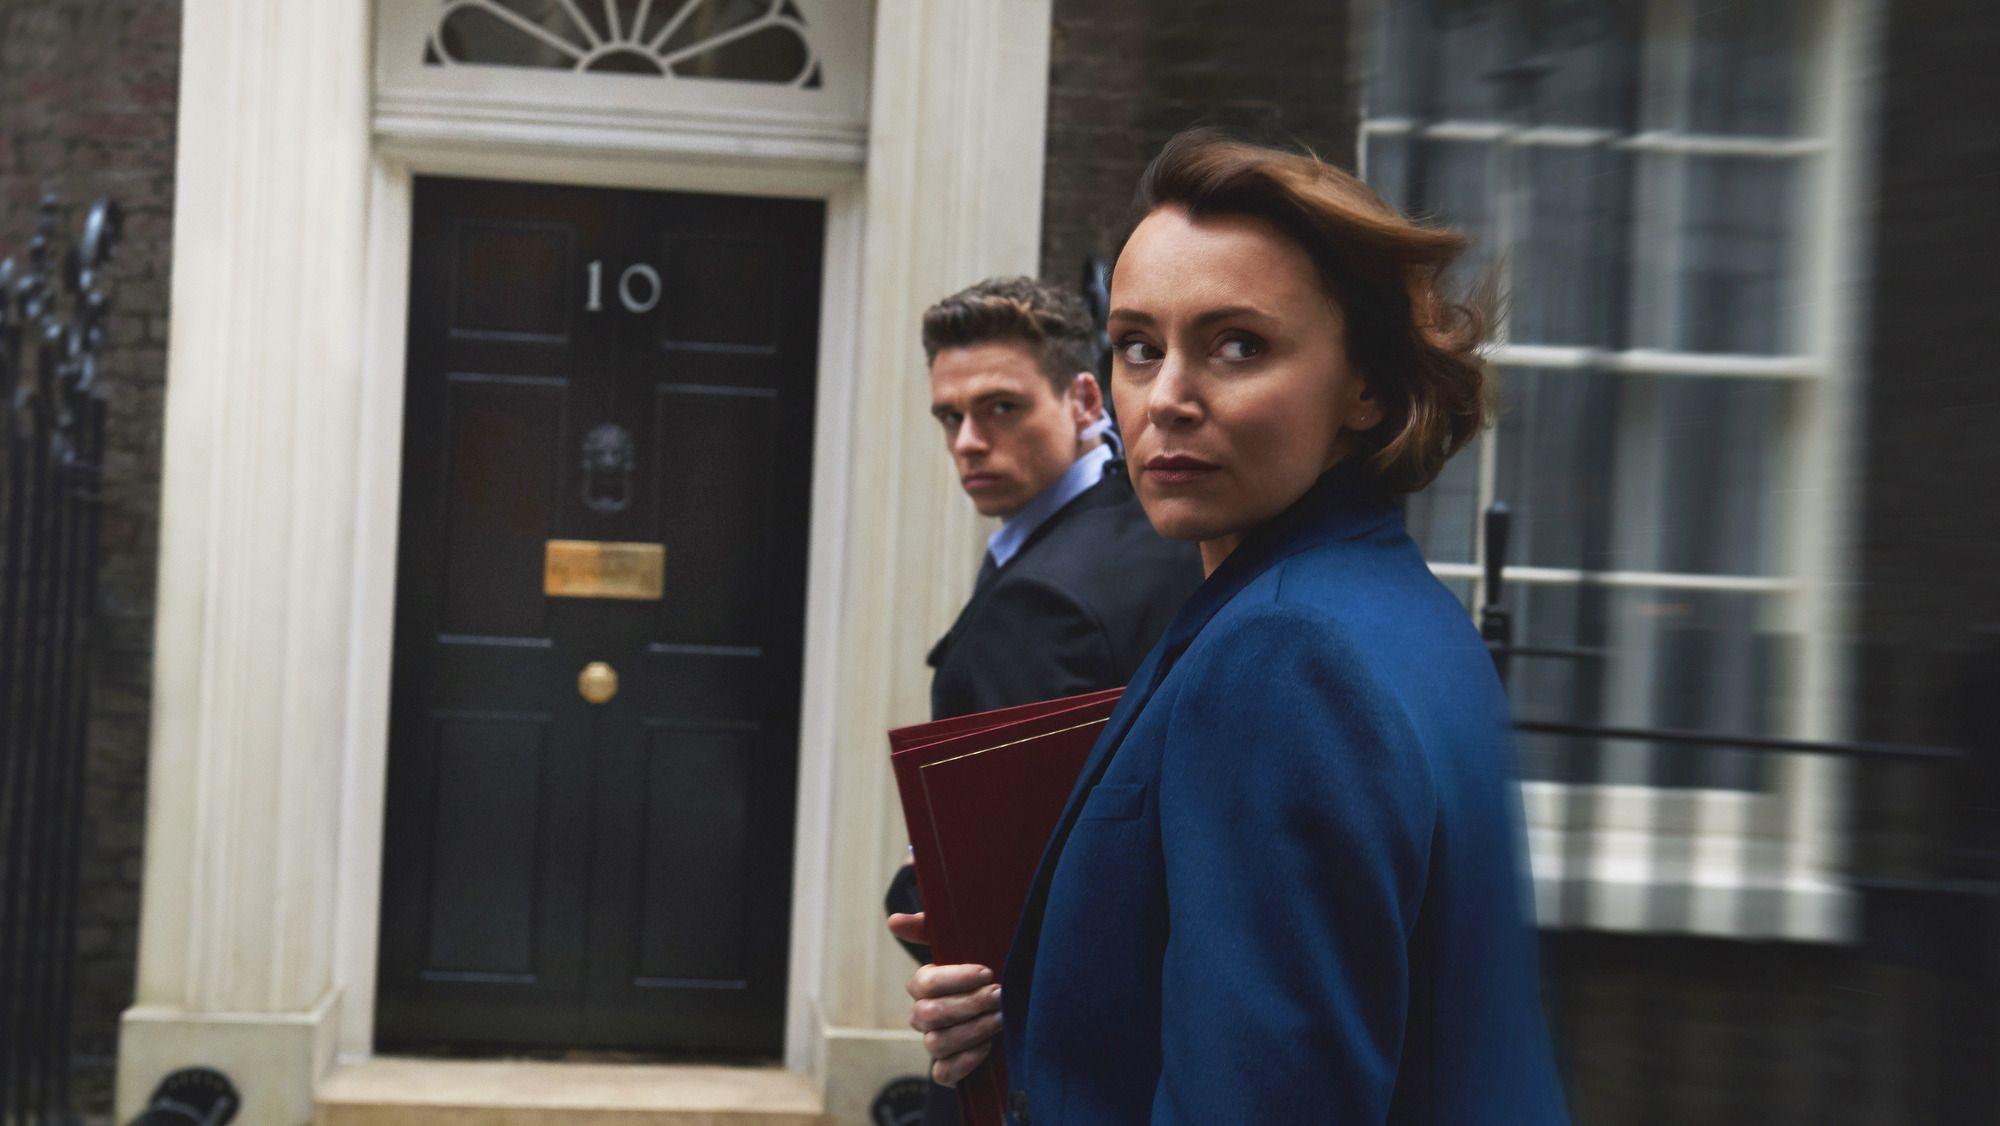 Bodyguard star Gina McKee on whether she'd return for season 2